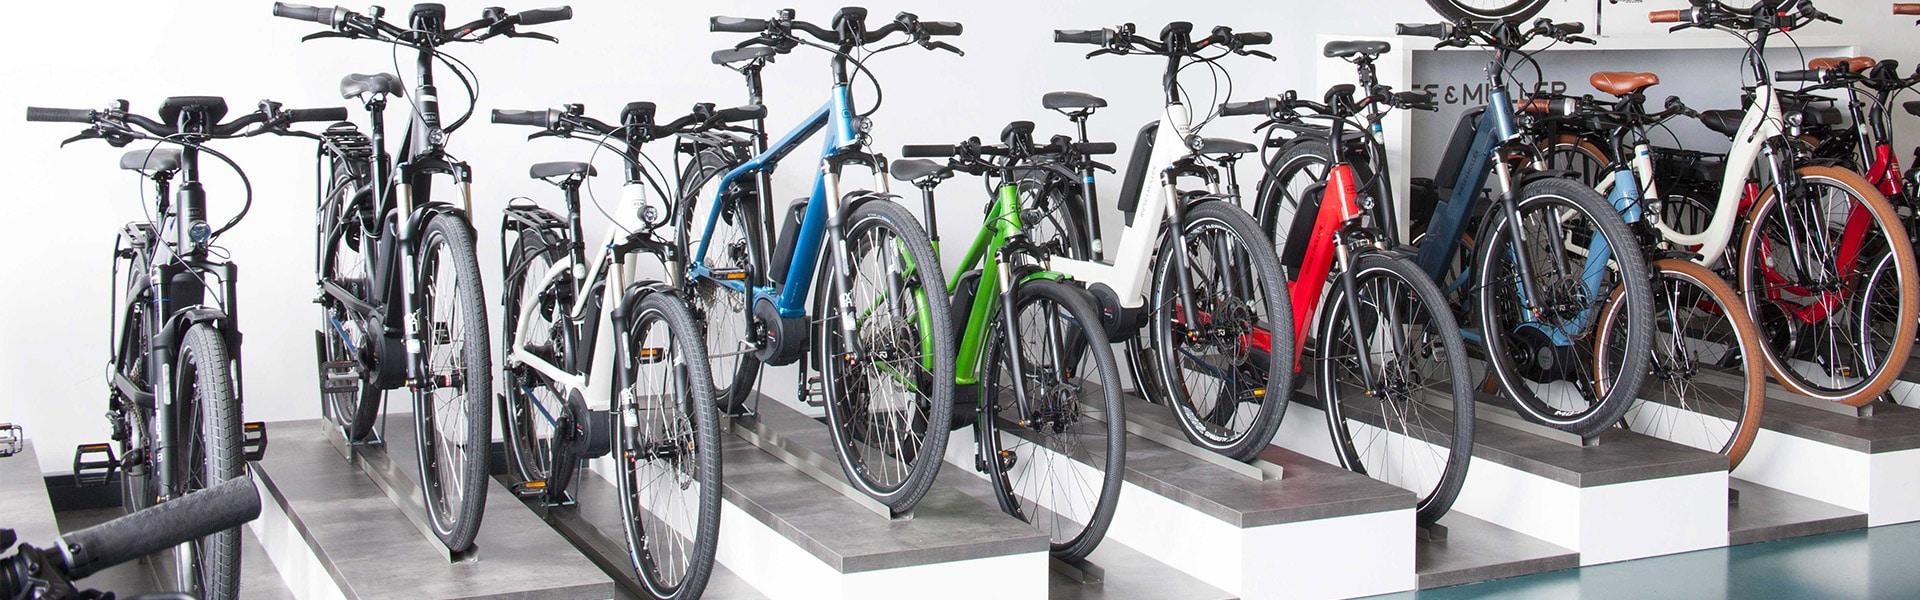 Der Shop der e-motion e-Bike Welt Ulm